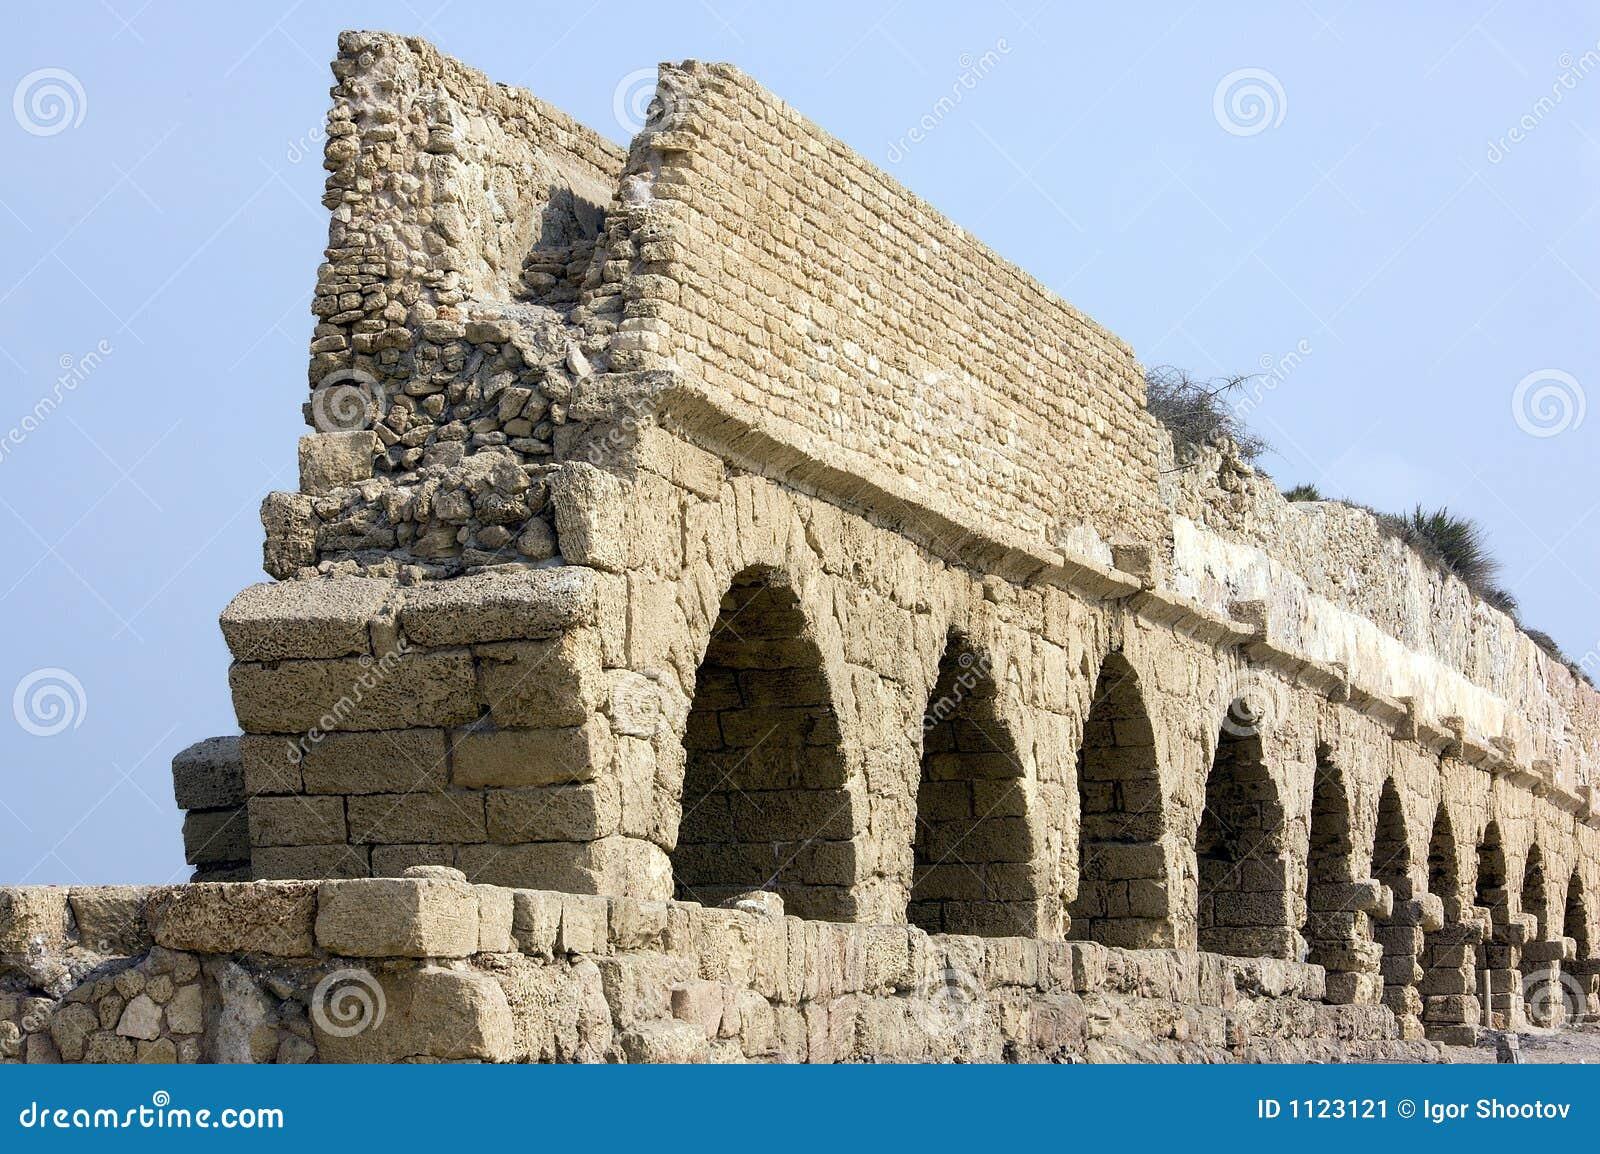 Ancient Roman Aqueduct Stock Image - Image: 1123121